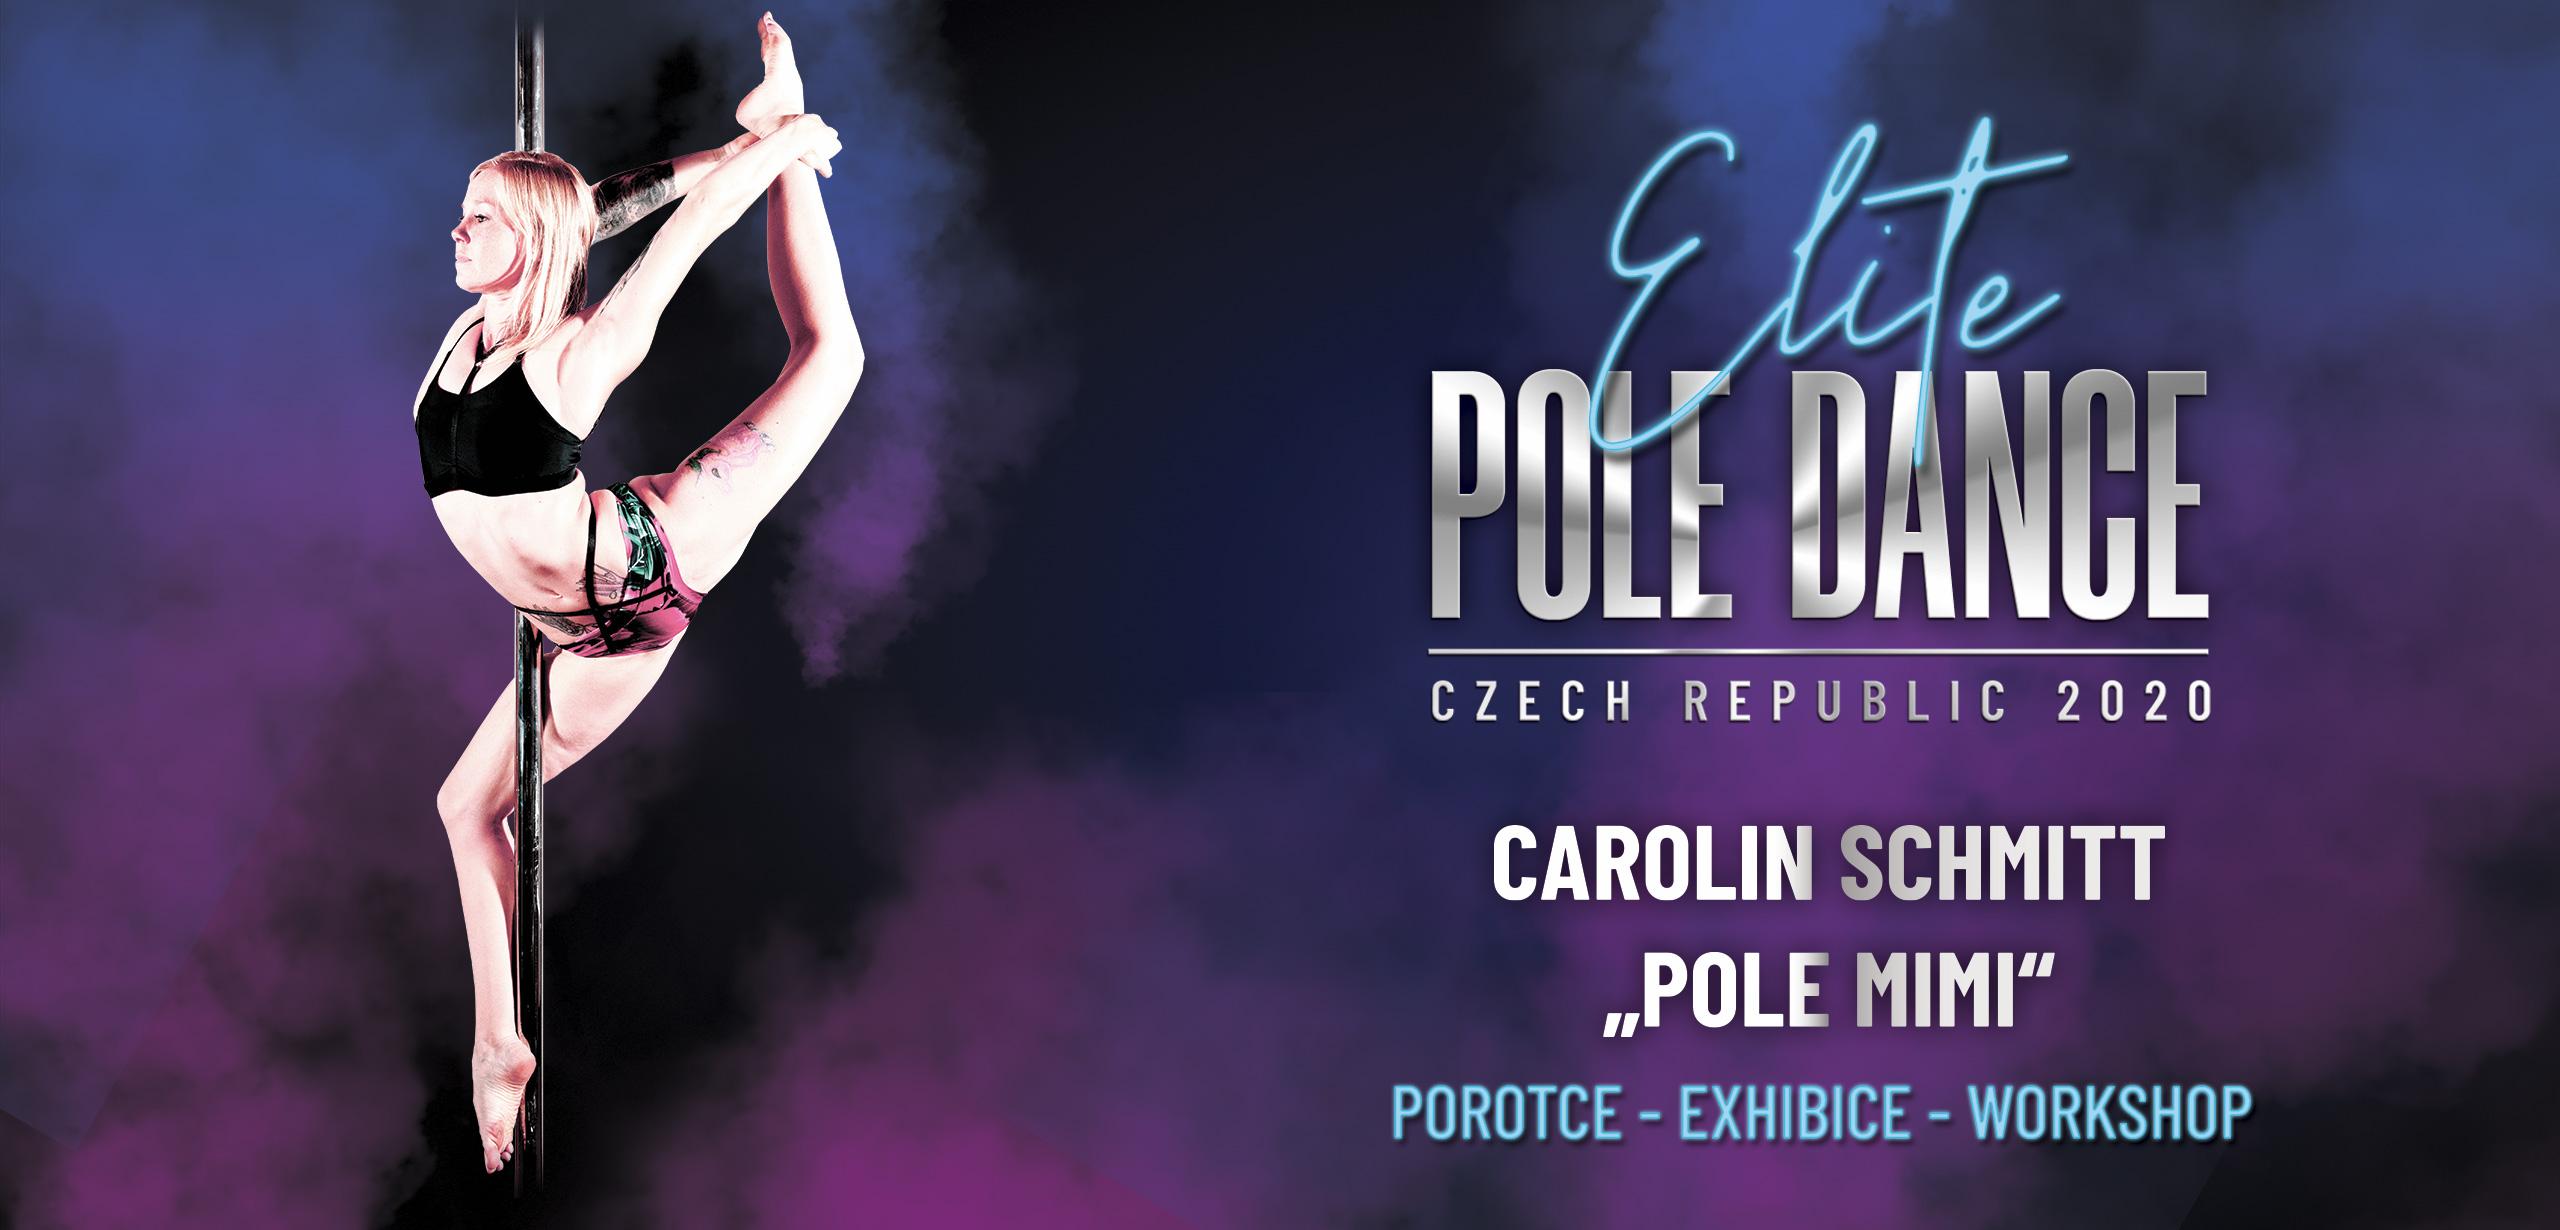 Elite Pole dance čr česká republika porota pole mimi carolin schmitt